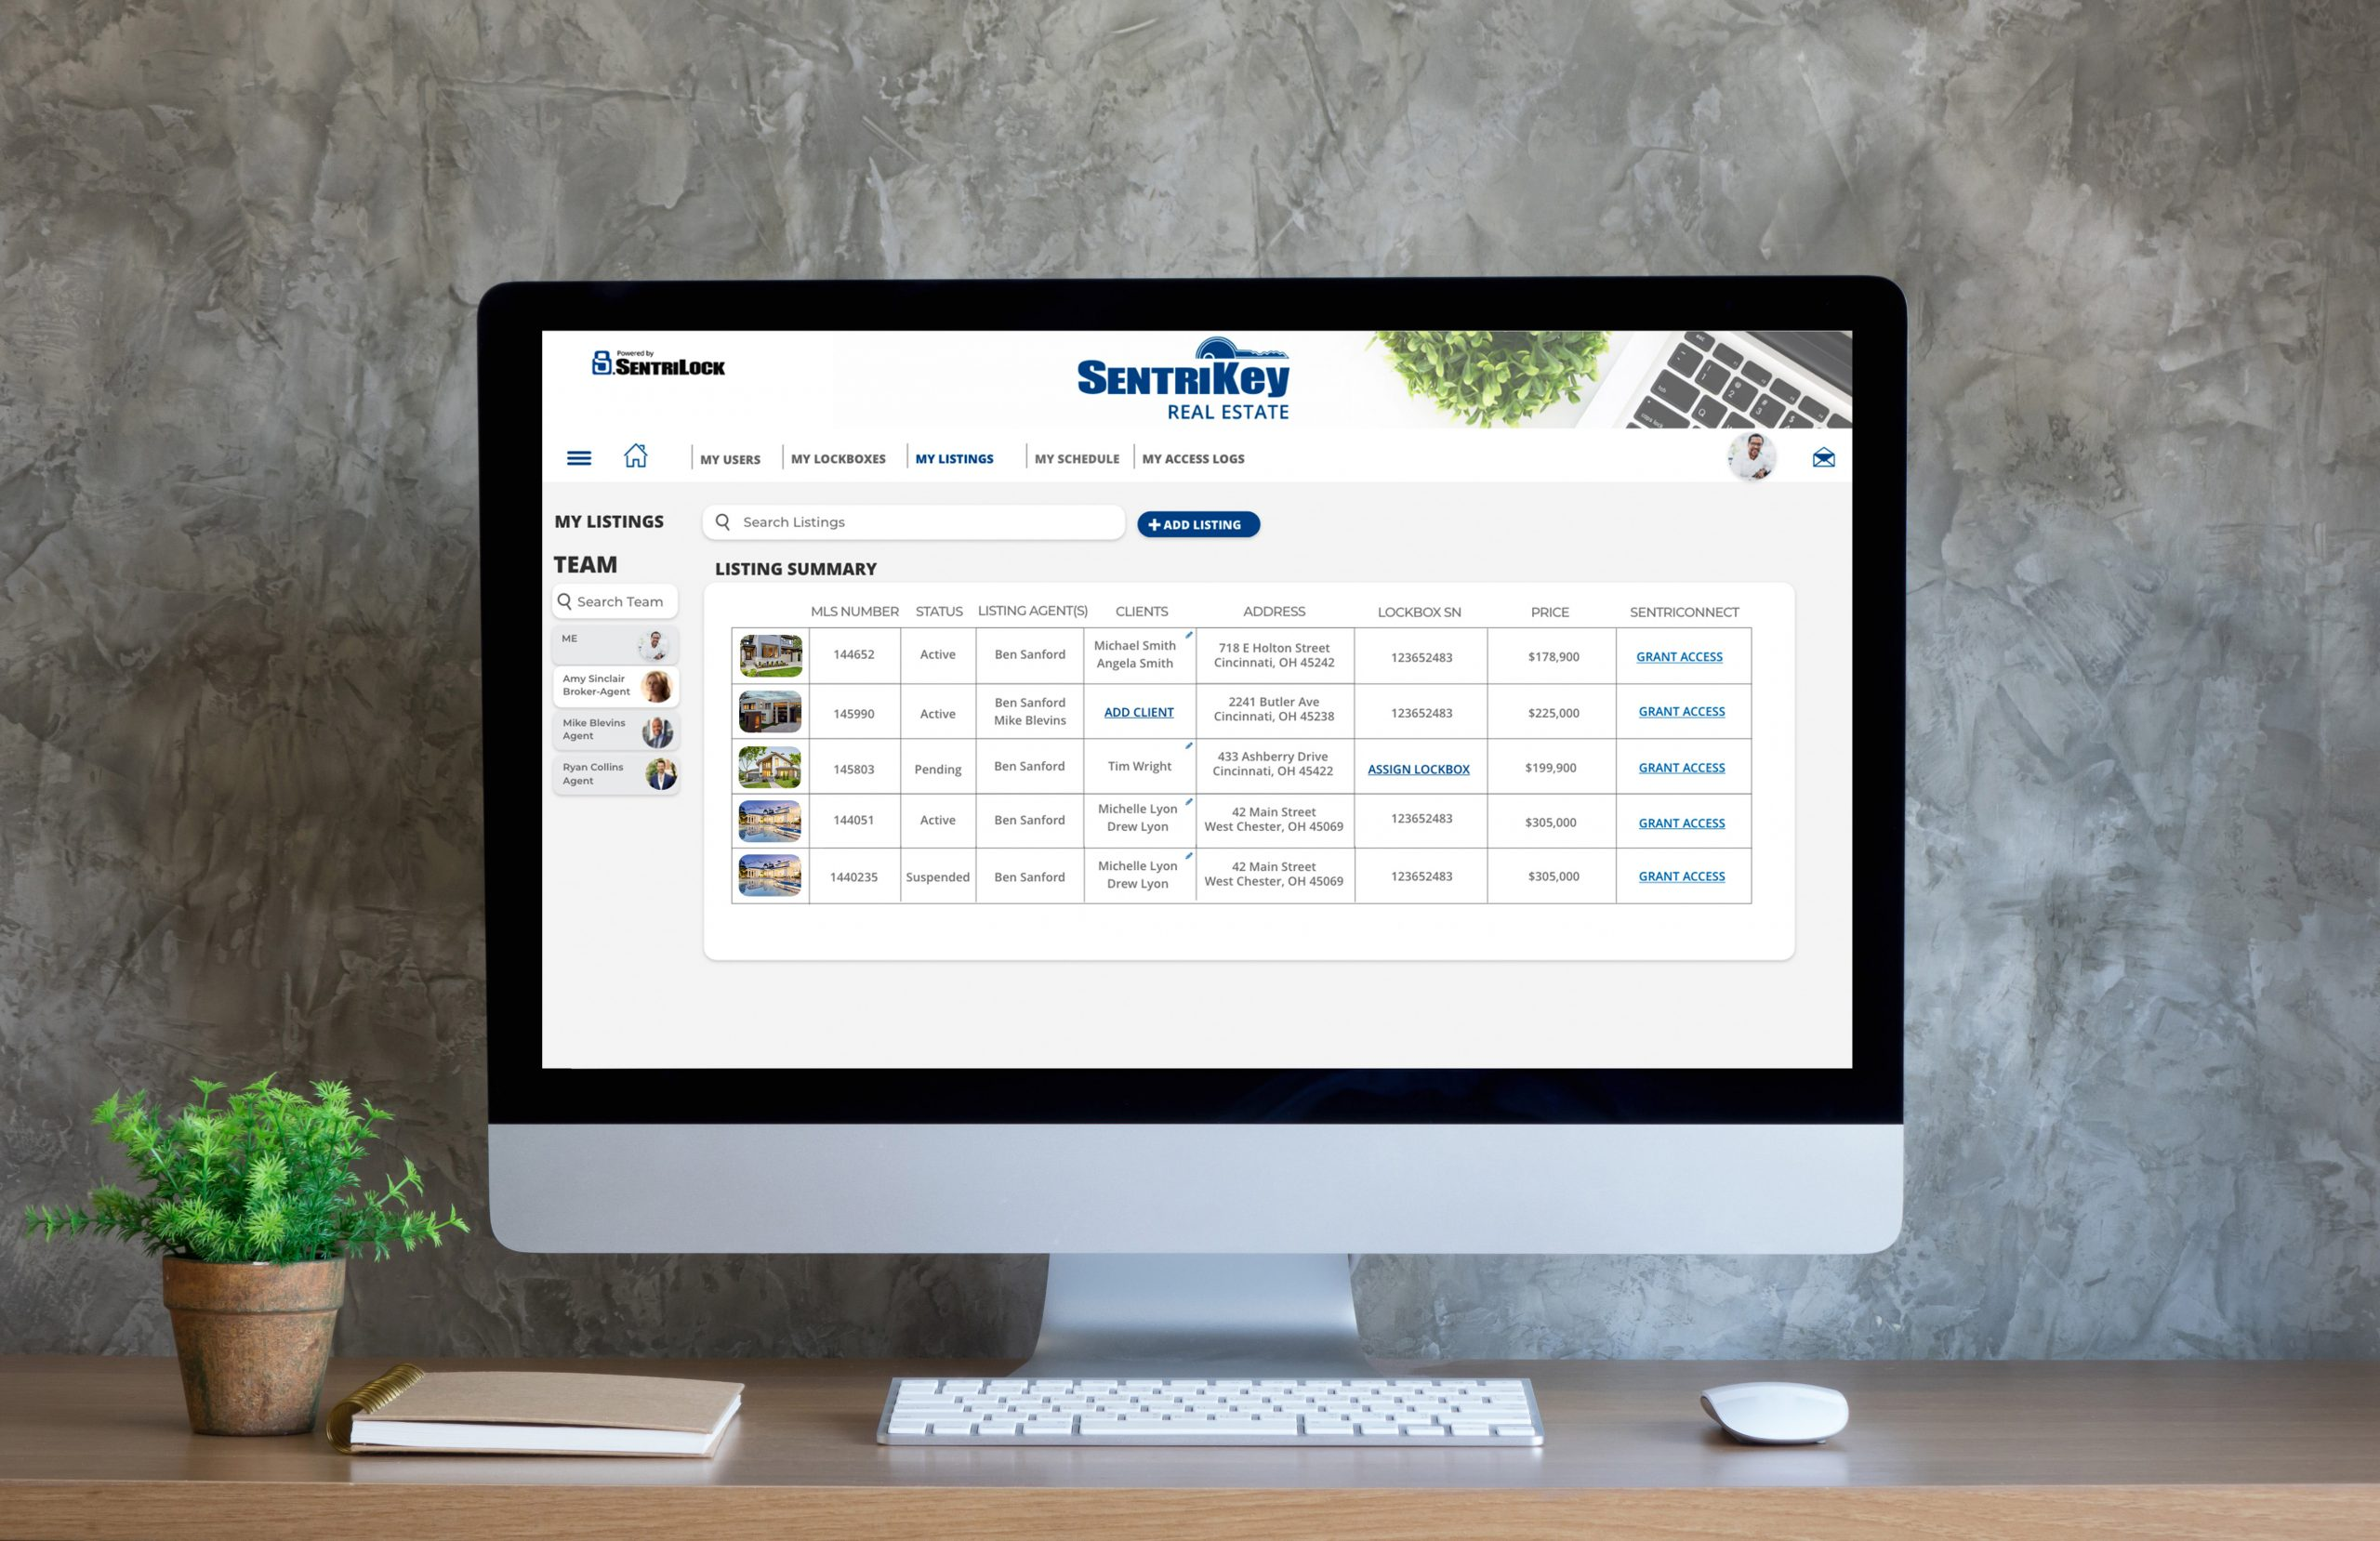 SentriKey Real Estate Website image[1]